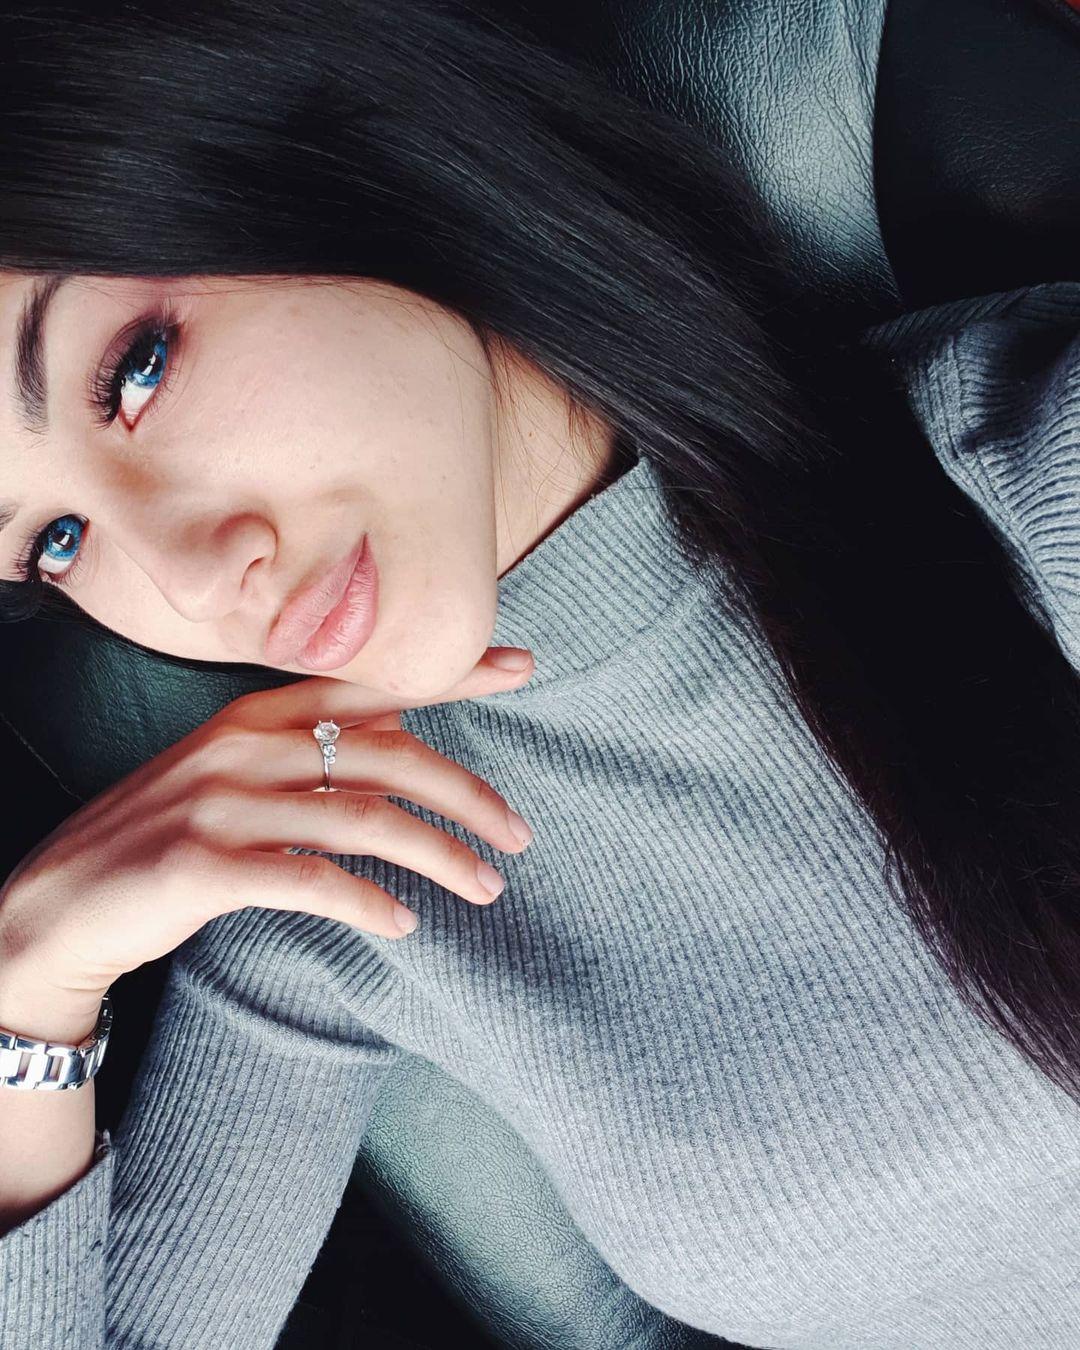 Fatima-Nezhdanova-Wallpapers-Insta-Fit-Bio-7